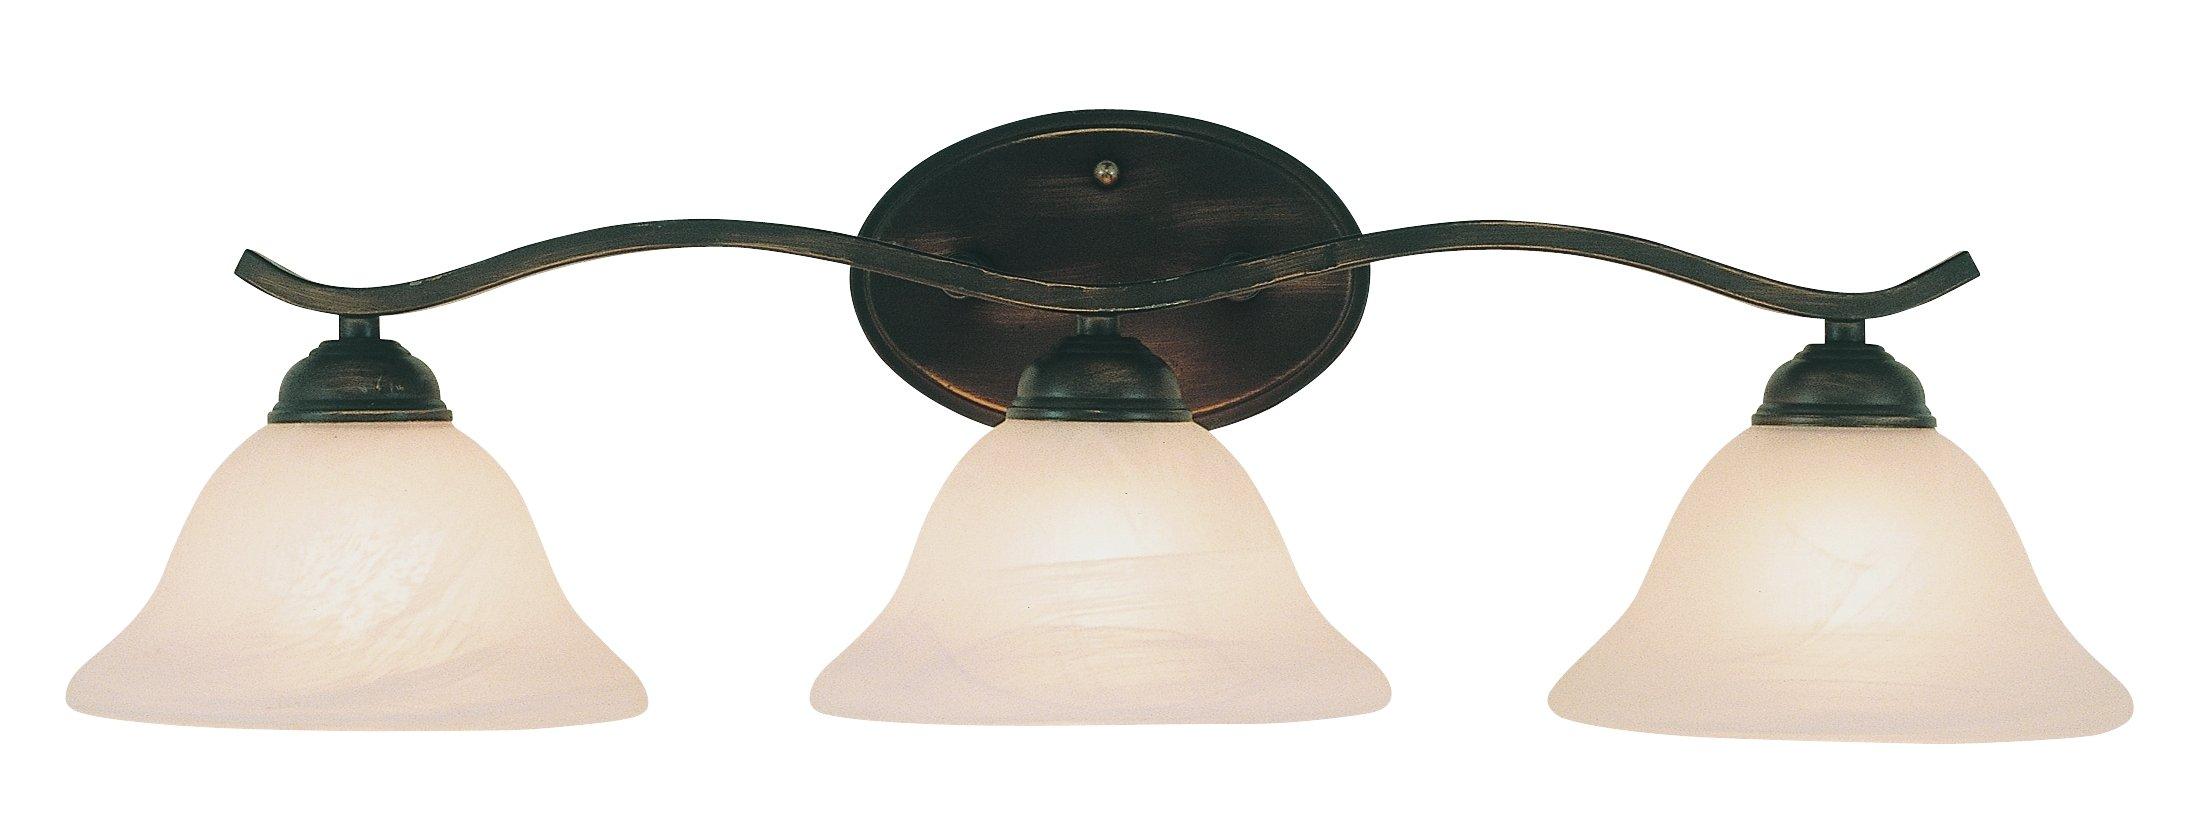 Trans Globe Lighting 2827 ROB Indoor  Hollyslope 26'' Vanity Bar, Rubbed Oil Bronze